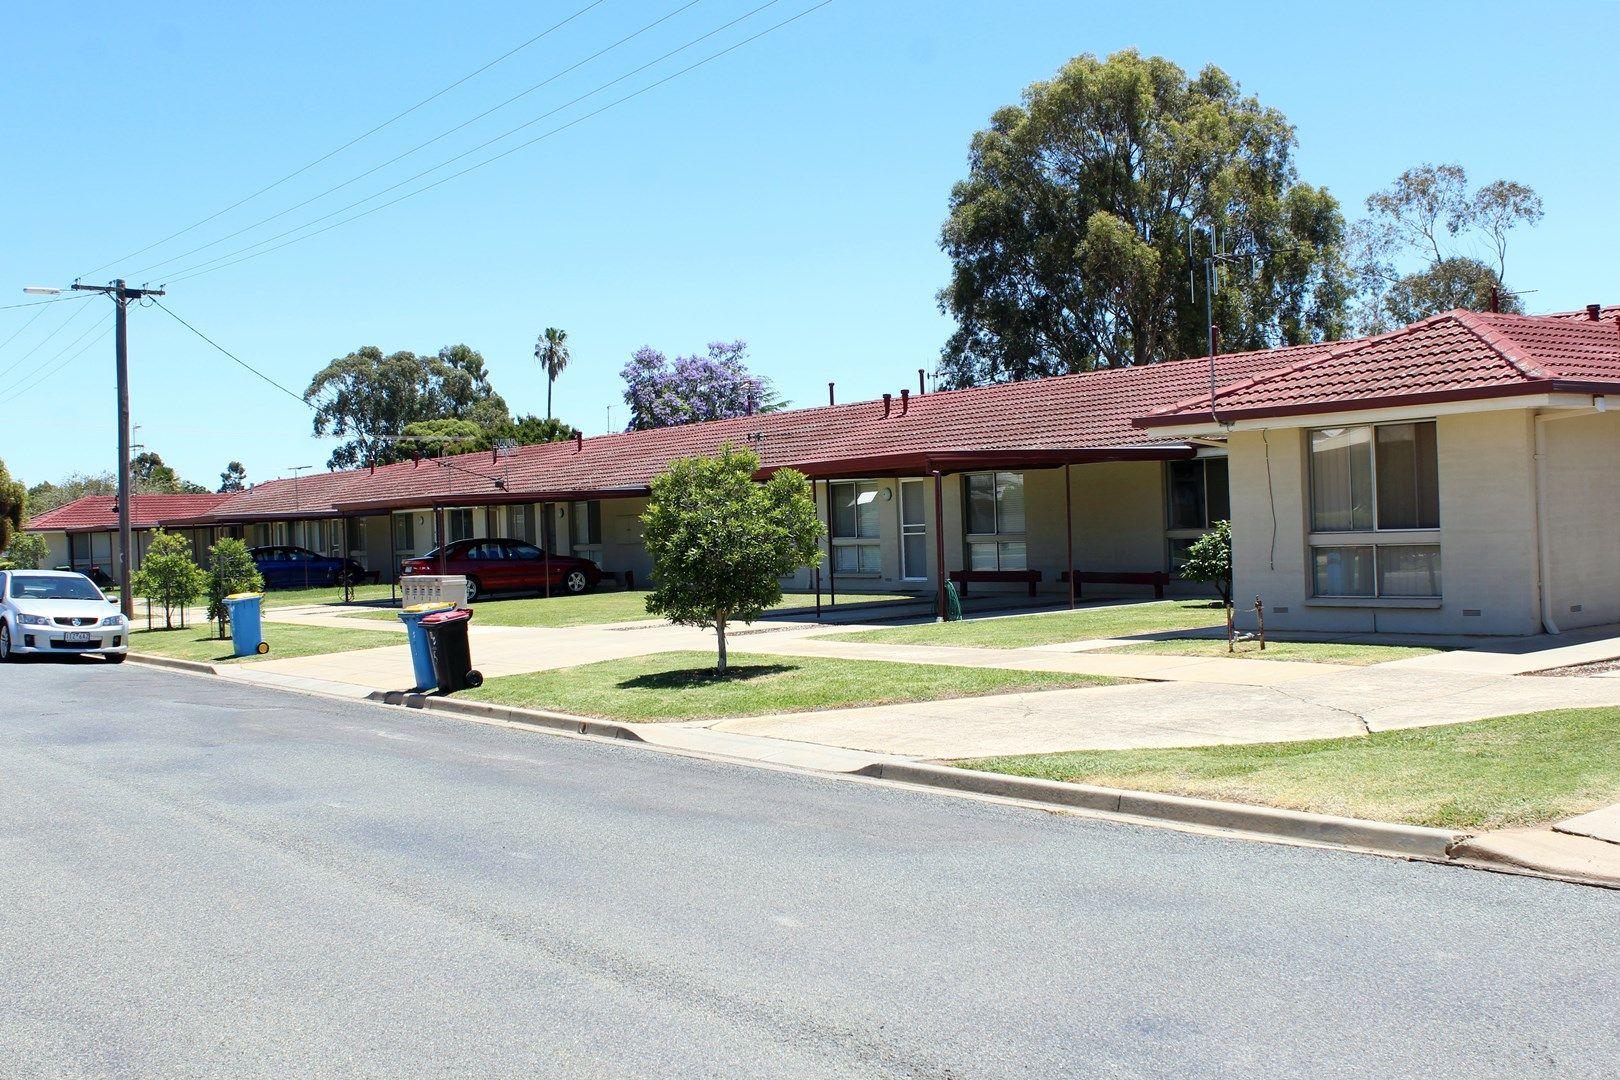 Unit 1-5, 7 Hughes Street, Tatura VIC 3616, Image 0